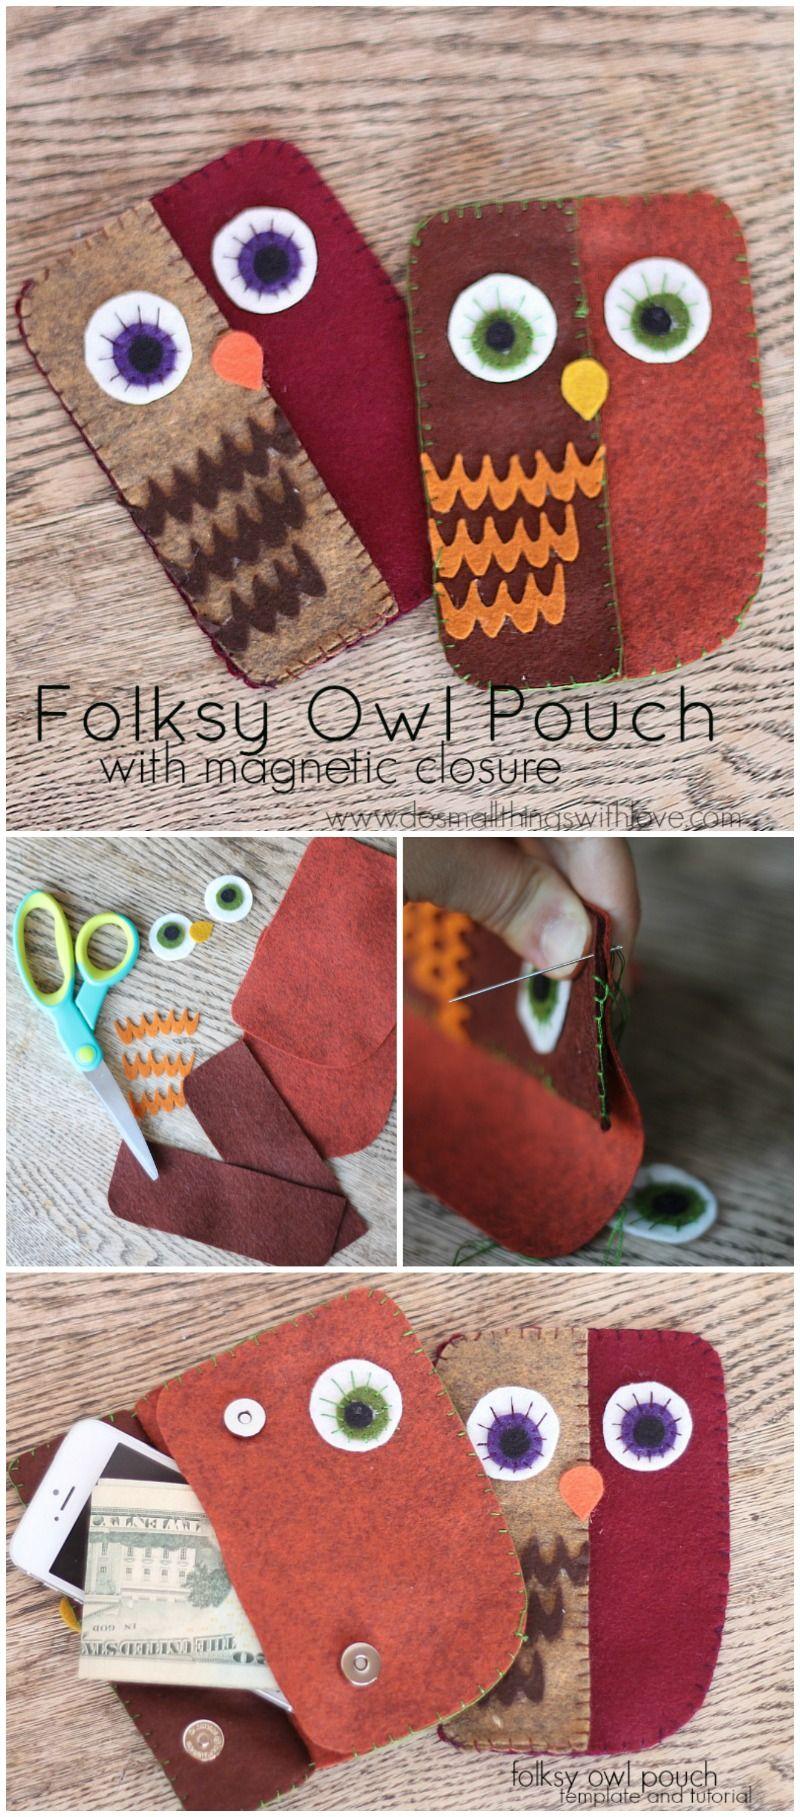 Folksy Owl Pouch